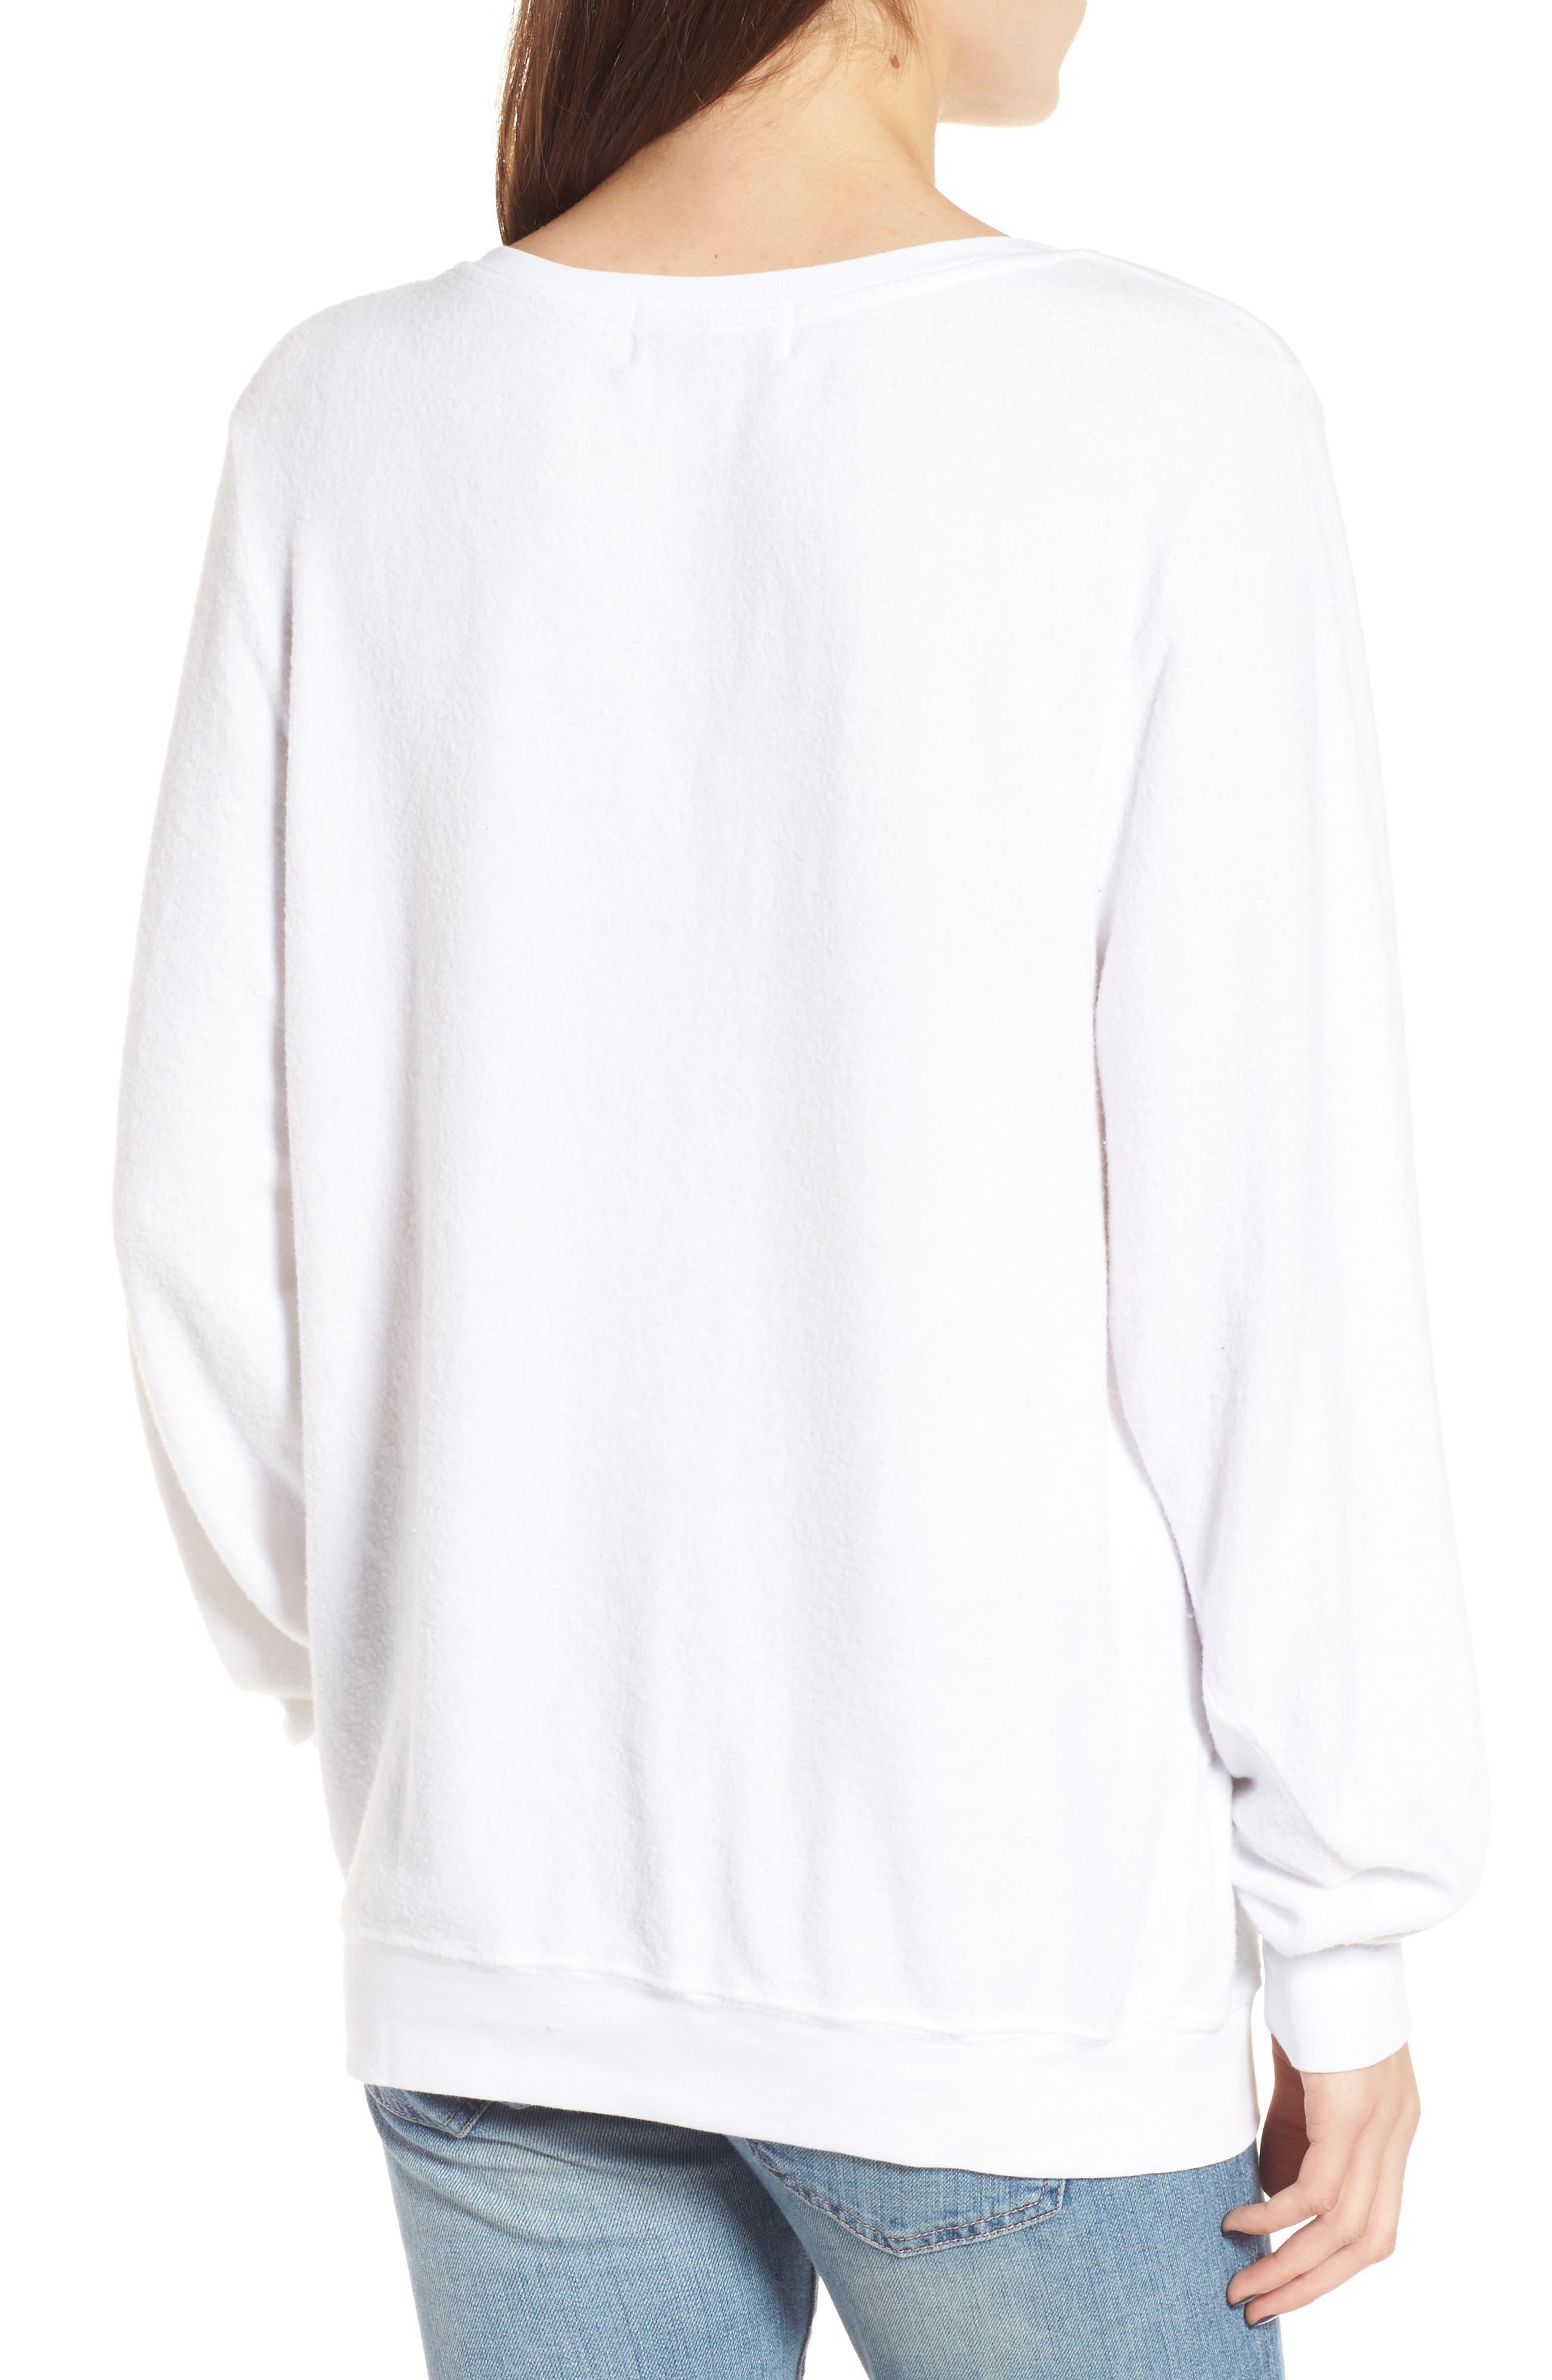 Stay Cool Polar Bear Sweatshirt,                             Alternate thumbnail 2, color,                             100